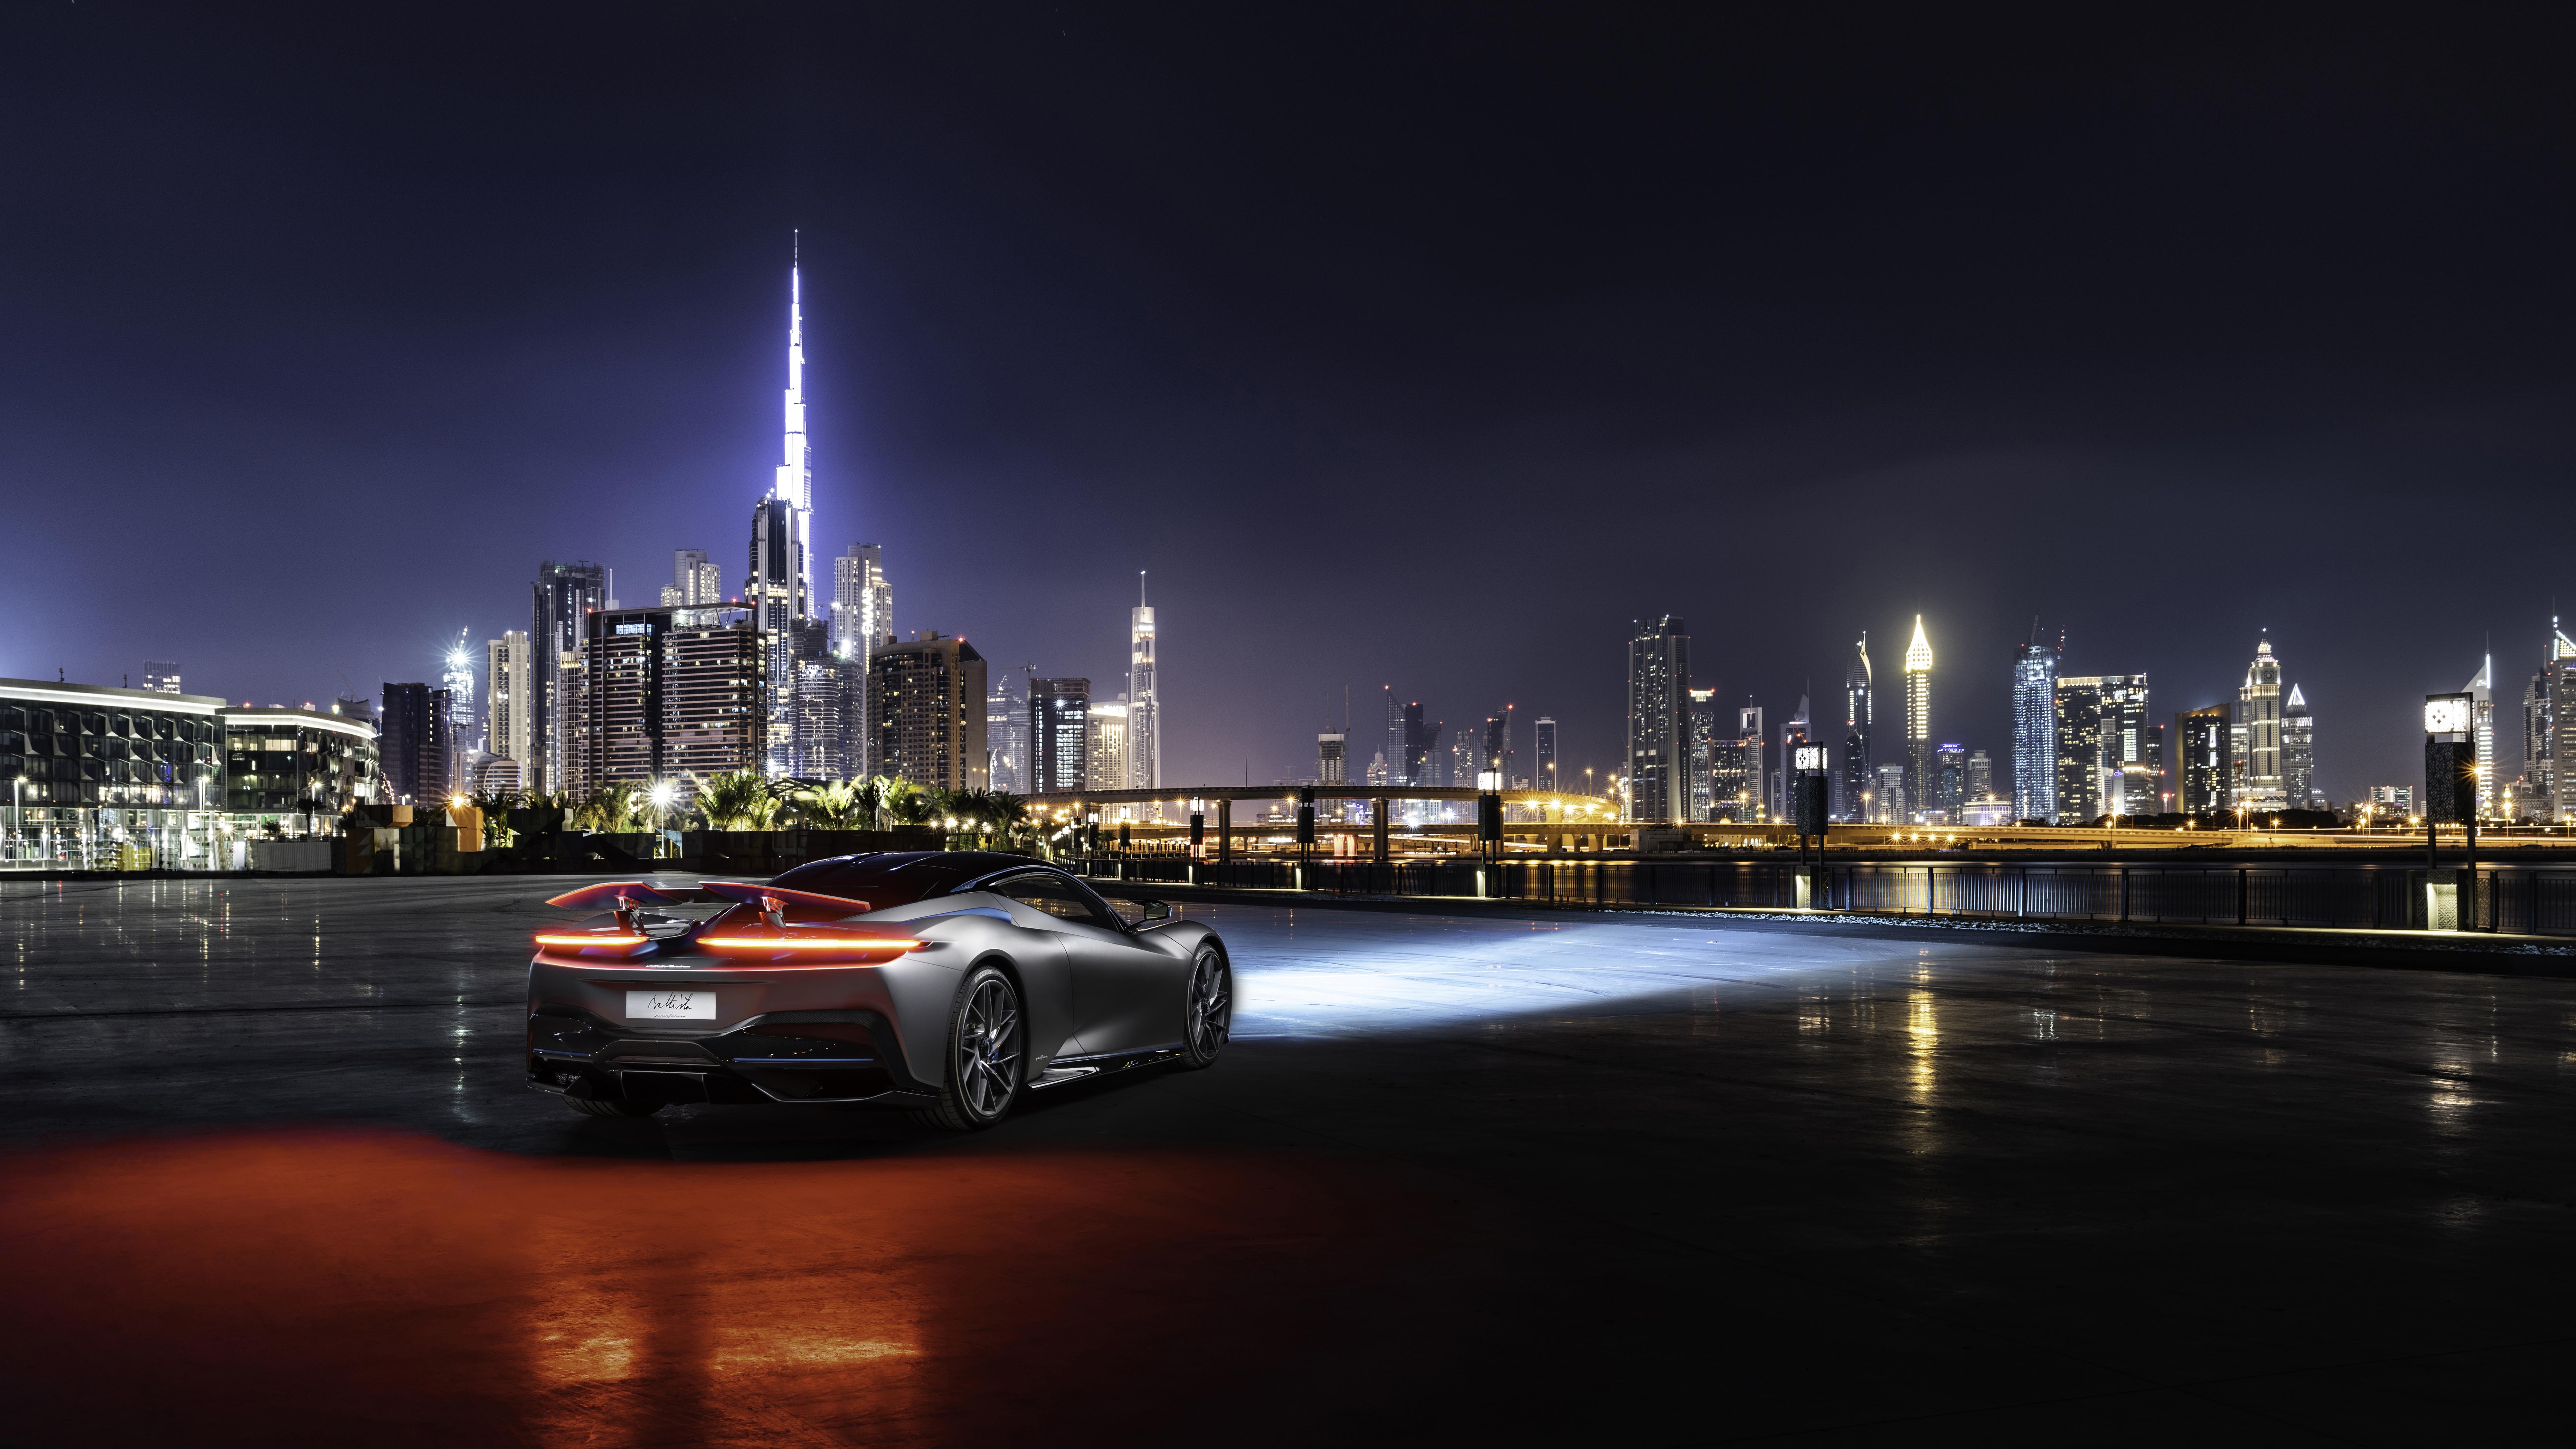 Pininfarina Battista 2019 Dubai 4k 8k Wallpaper Hd Car